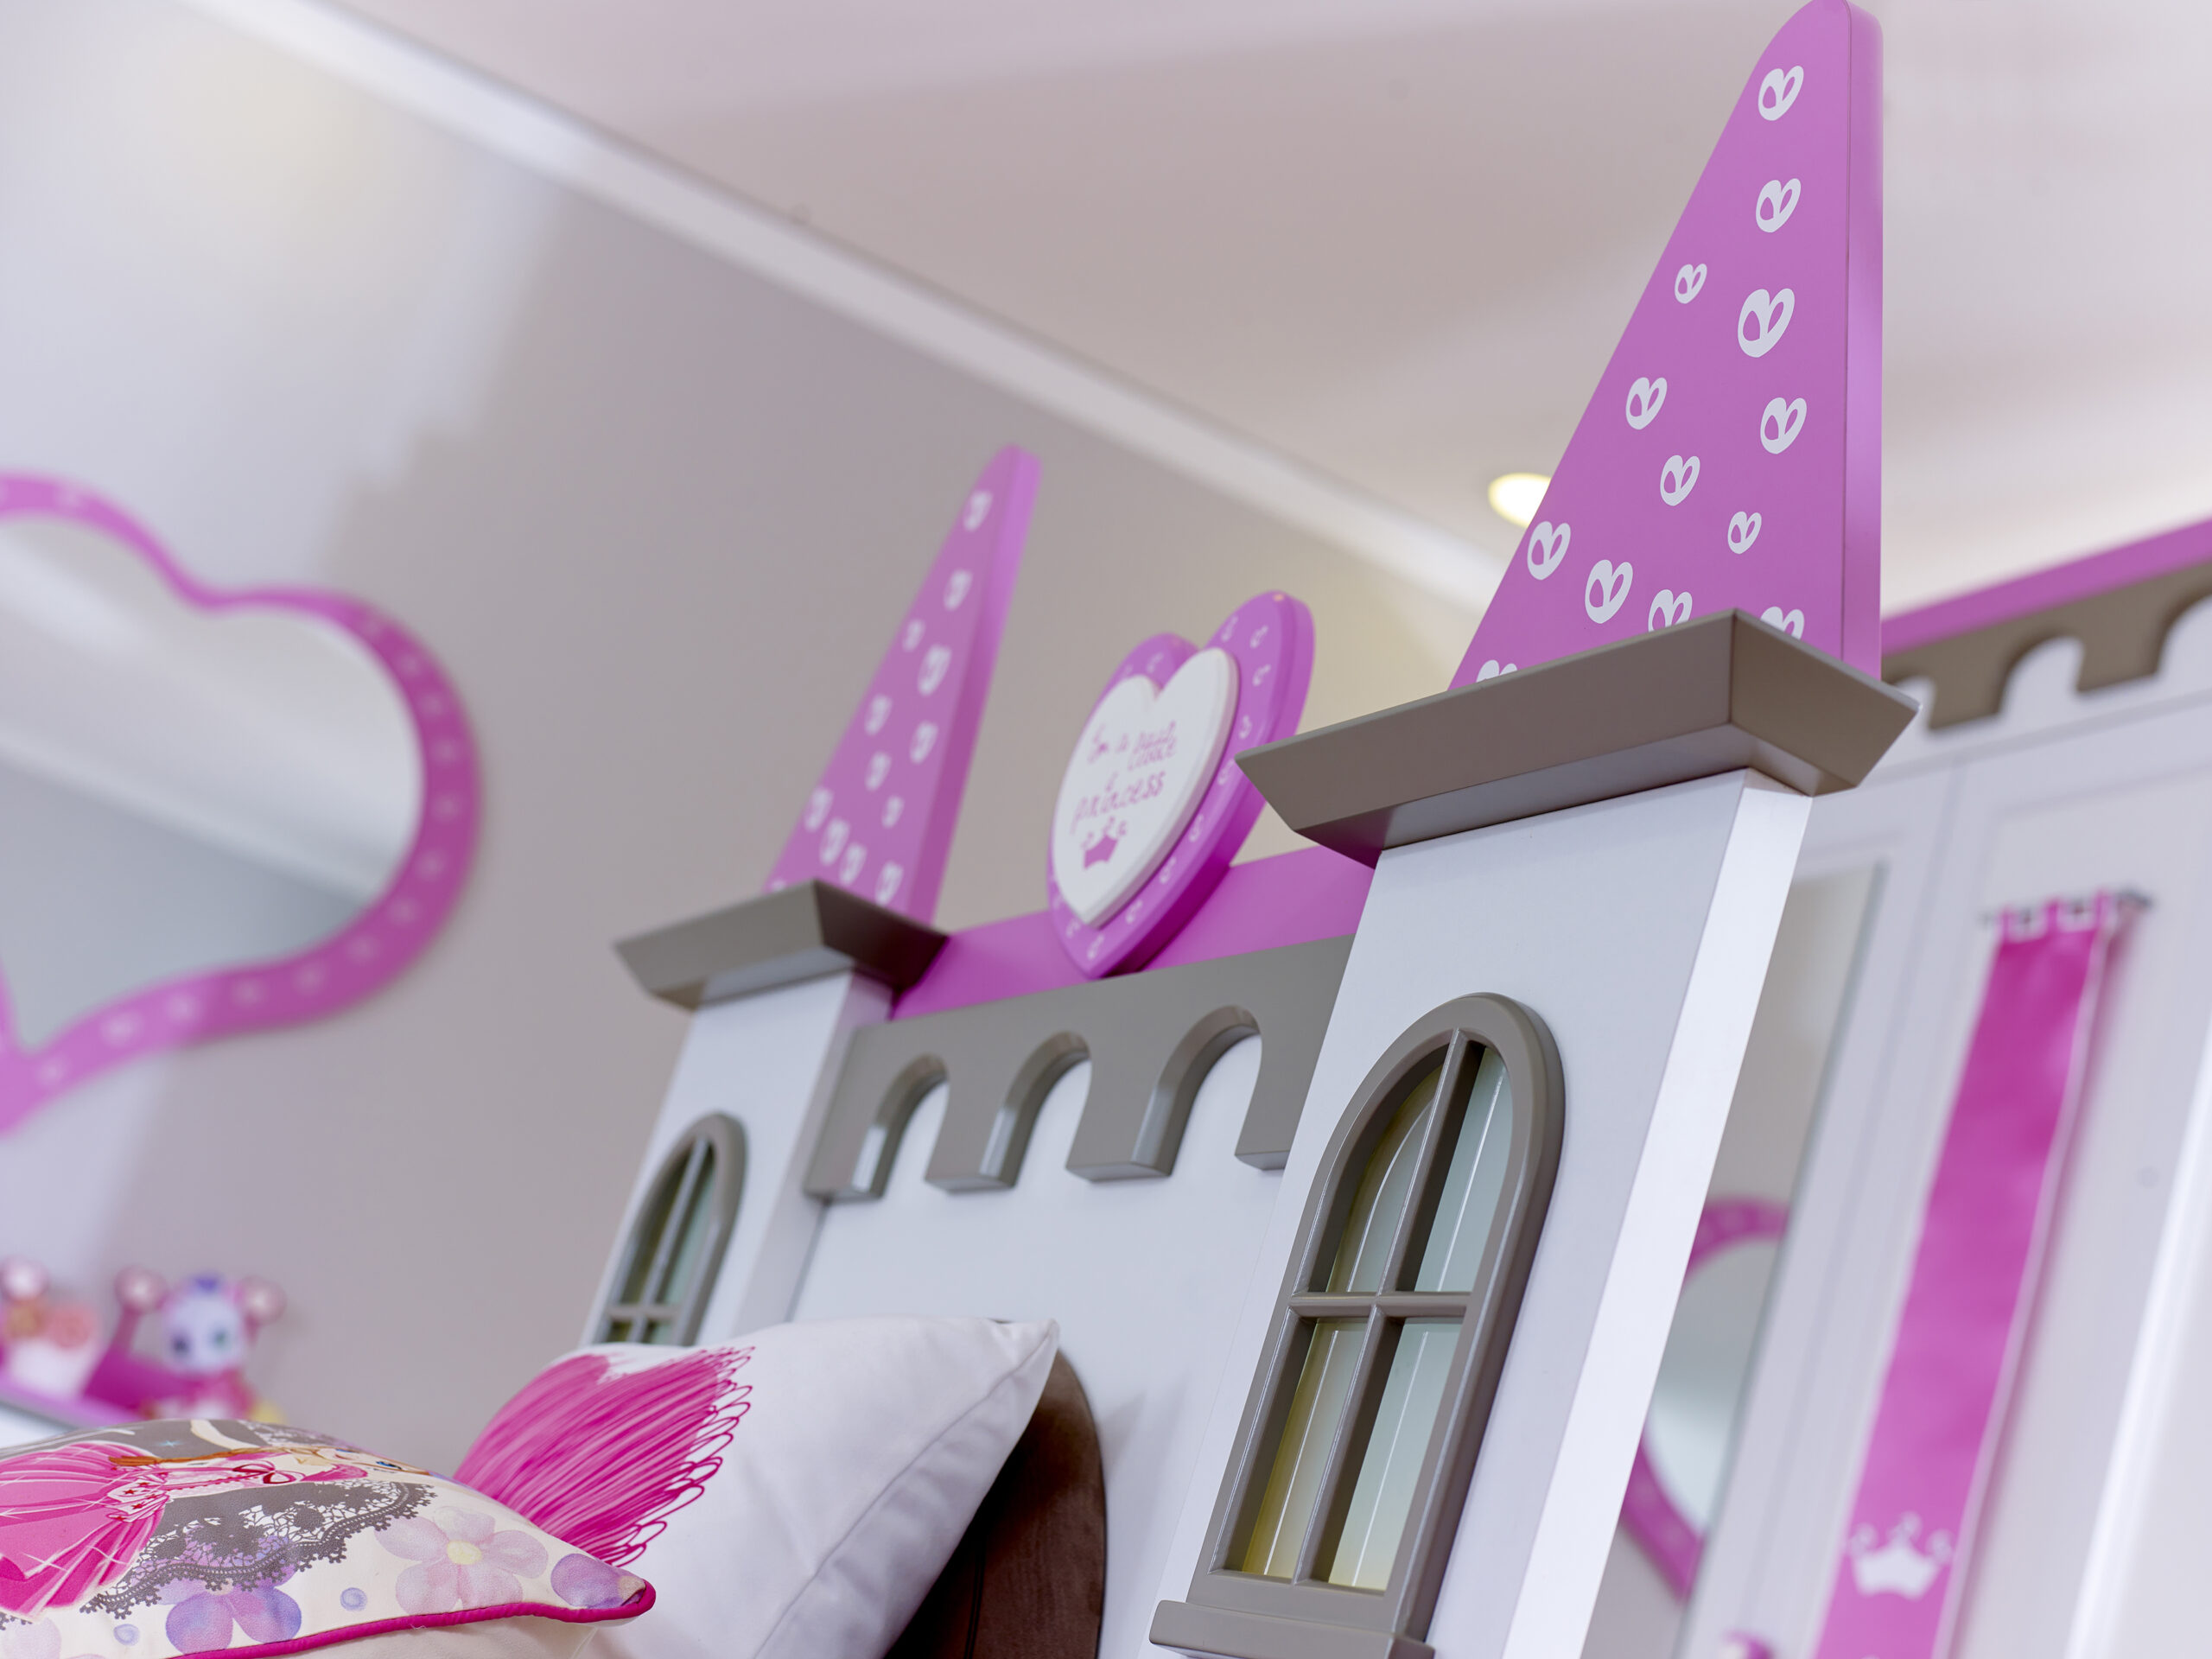 Full Size of Mädchenbetten Bett Kinderbett Mdchen Schloss Prinzessin Traumzimmer Wohnzimmer Mädchenbetten